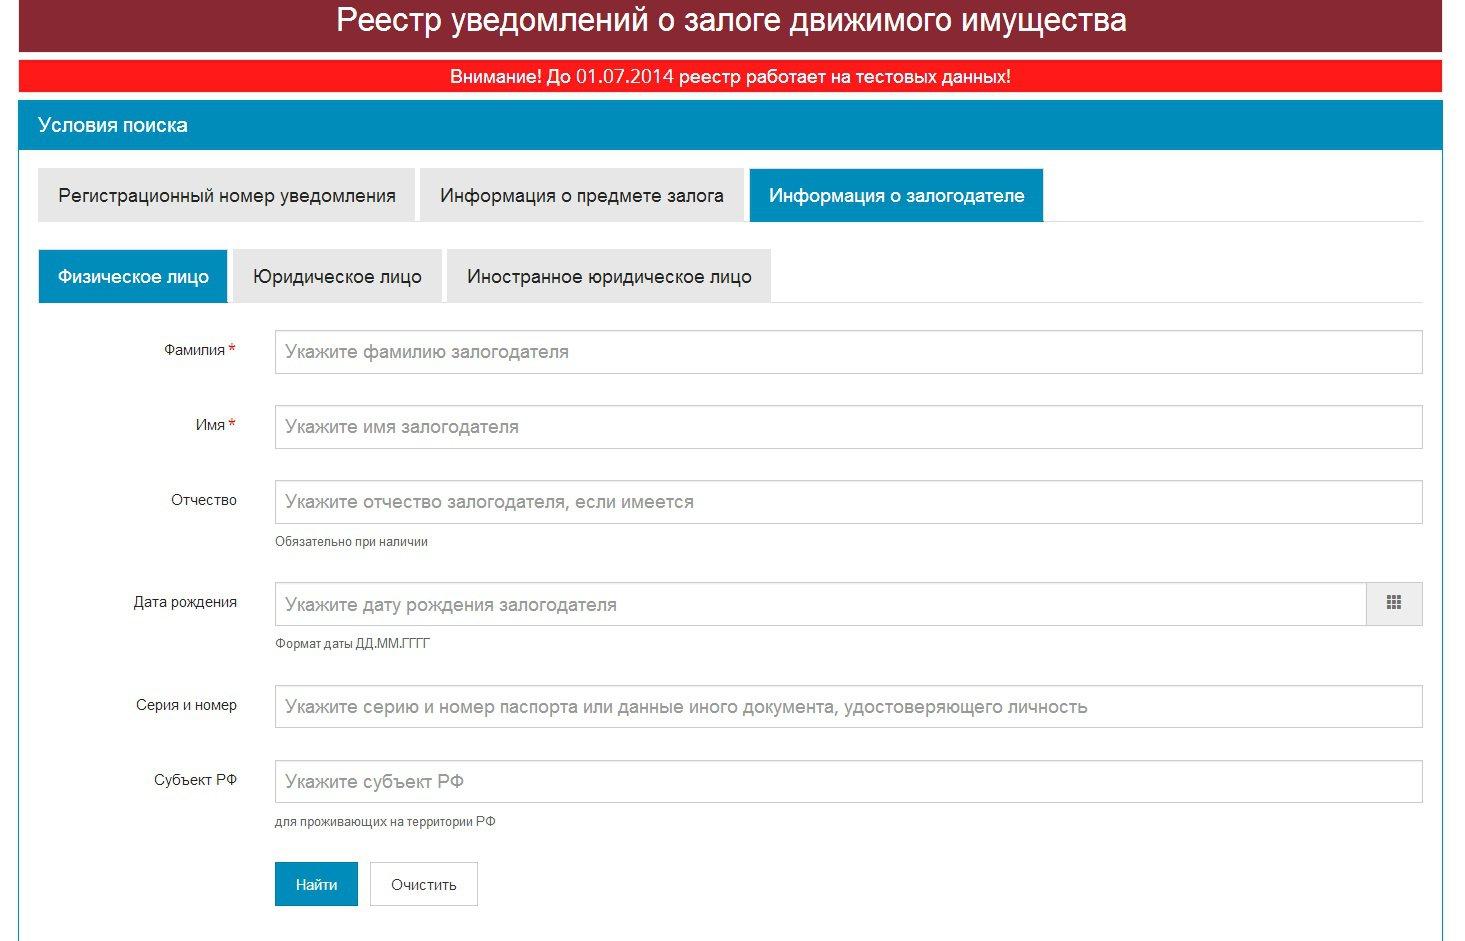 Нотариус реестр залога авто автосалон в москве форза